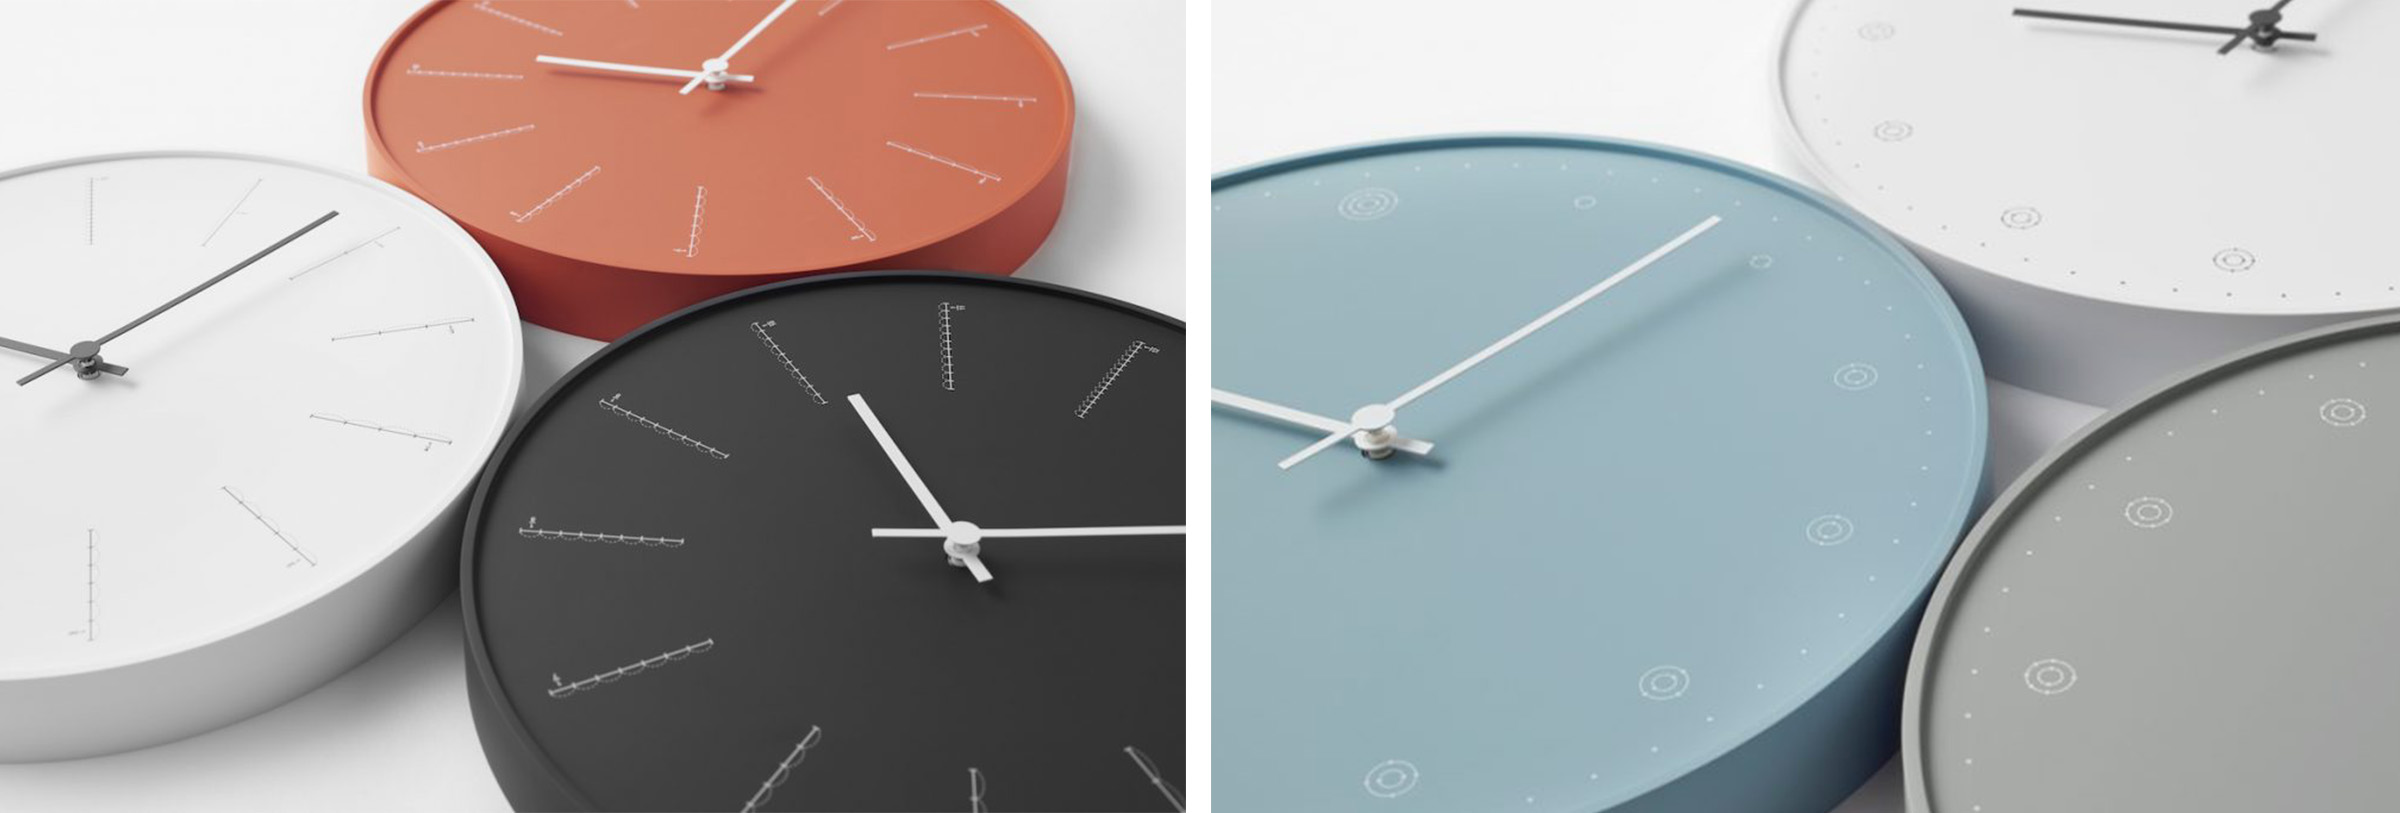 wanduhr modern hochwertig online kaufen satamo. Black Bedroom Furniture Sets. Home Design Ideas